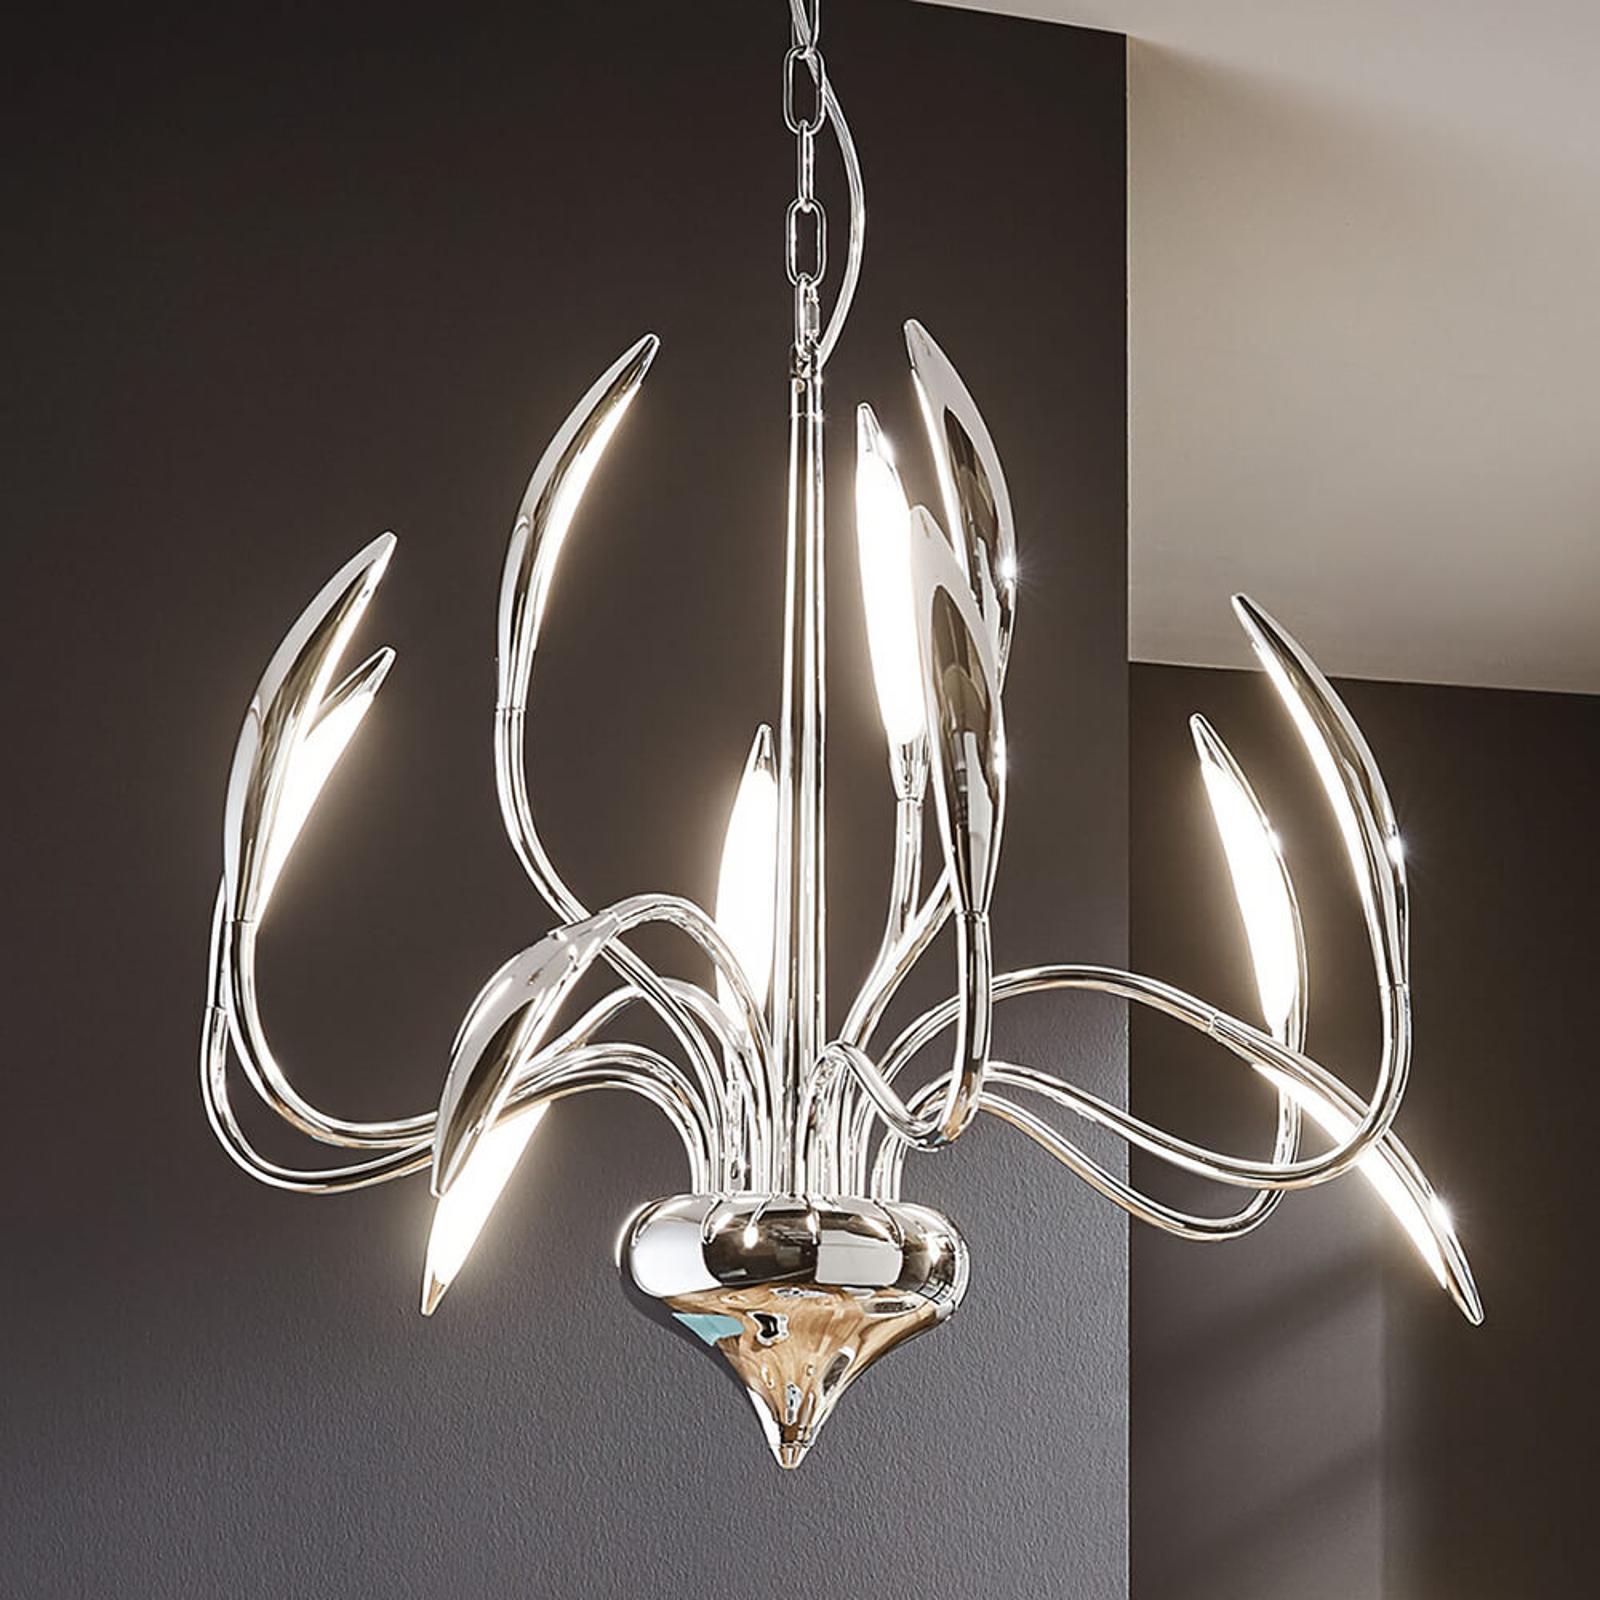 LED-pendellampe Hampton med tolv lys